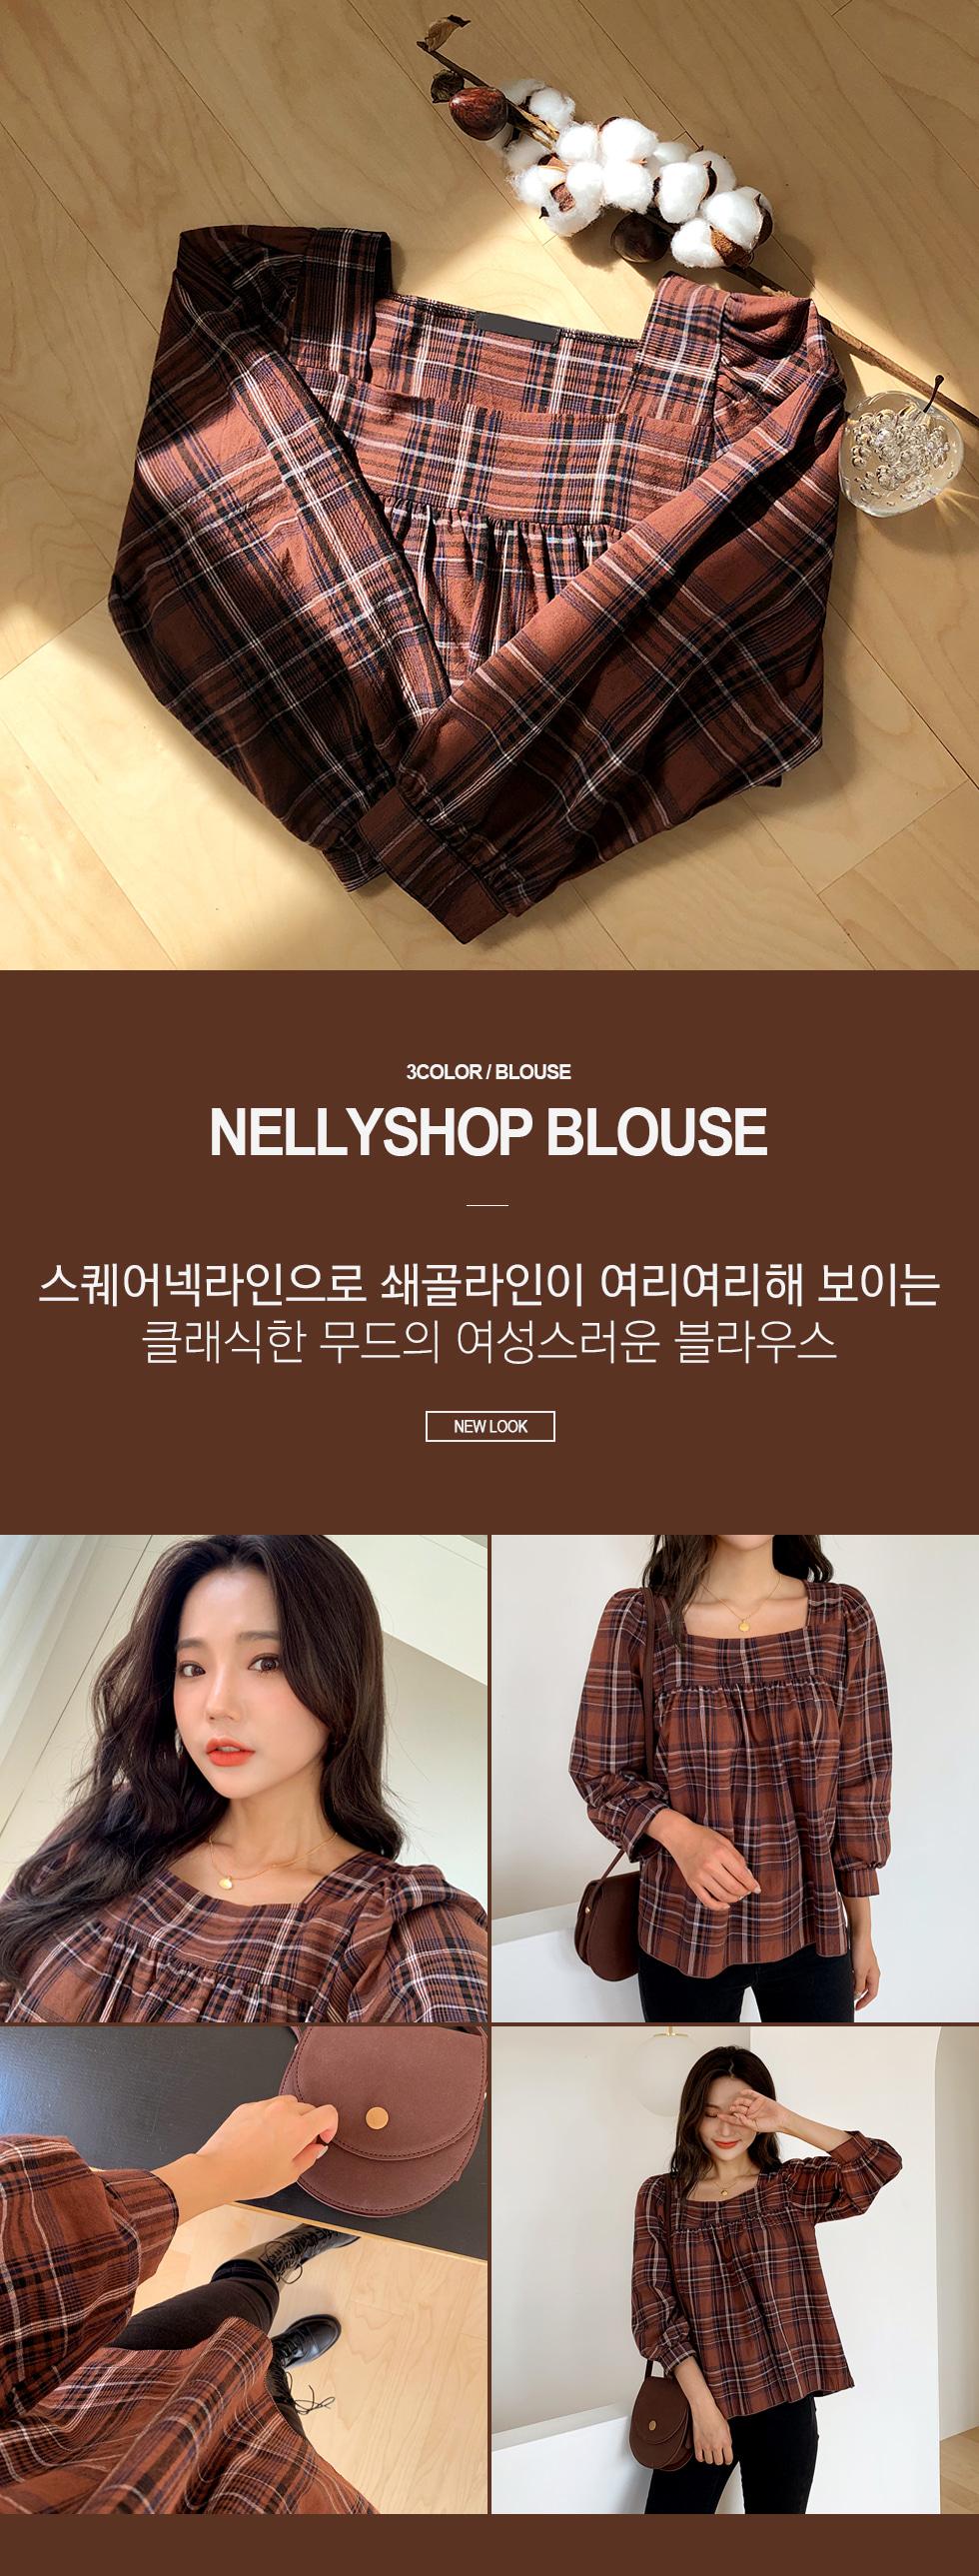 Nelly Shop Blouse